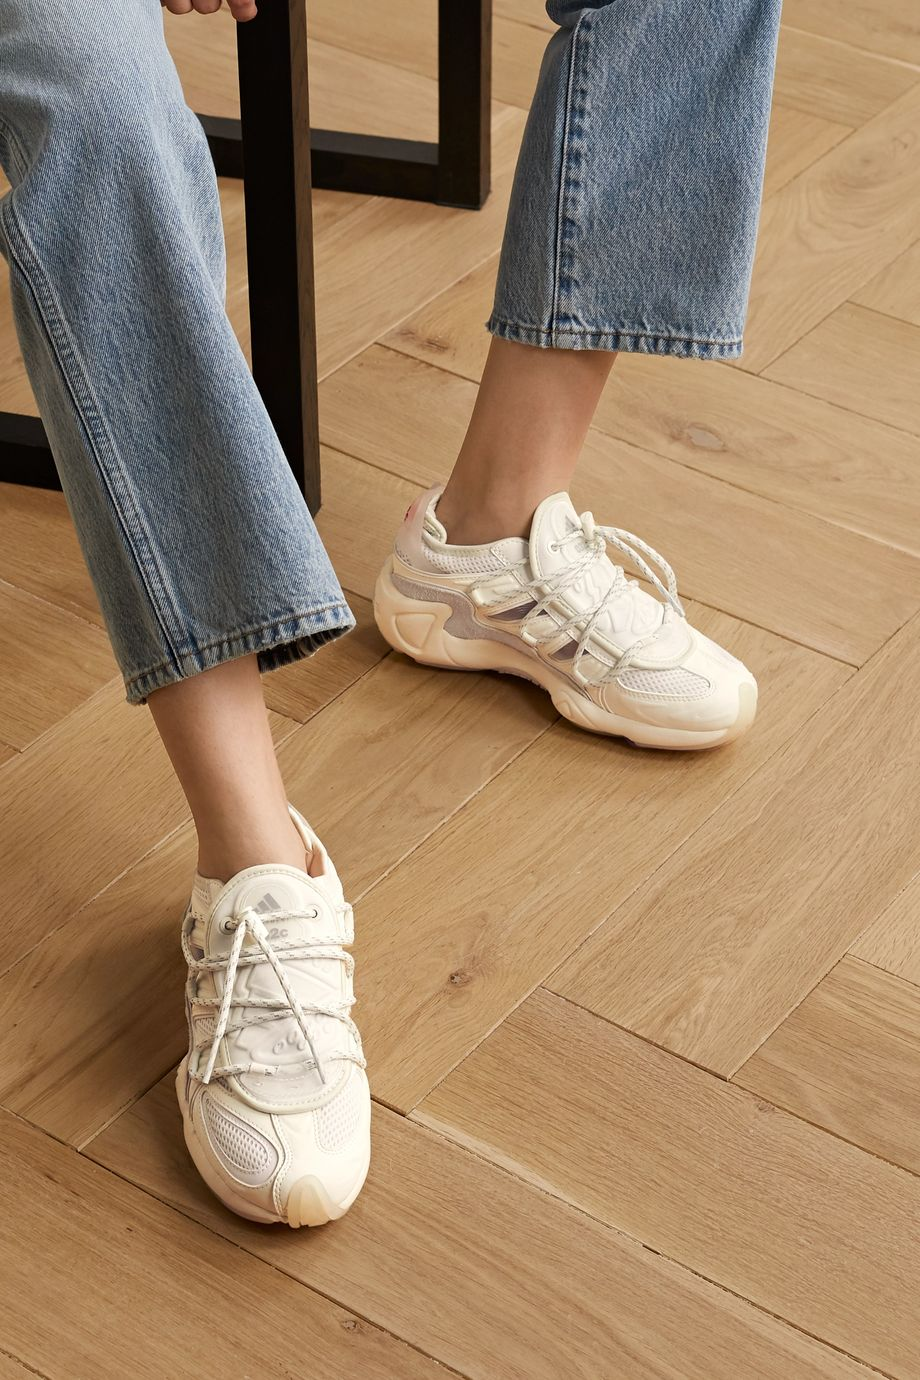 adidas Originals +032C Salvation leather, suede, mesh and neoprene sneakers